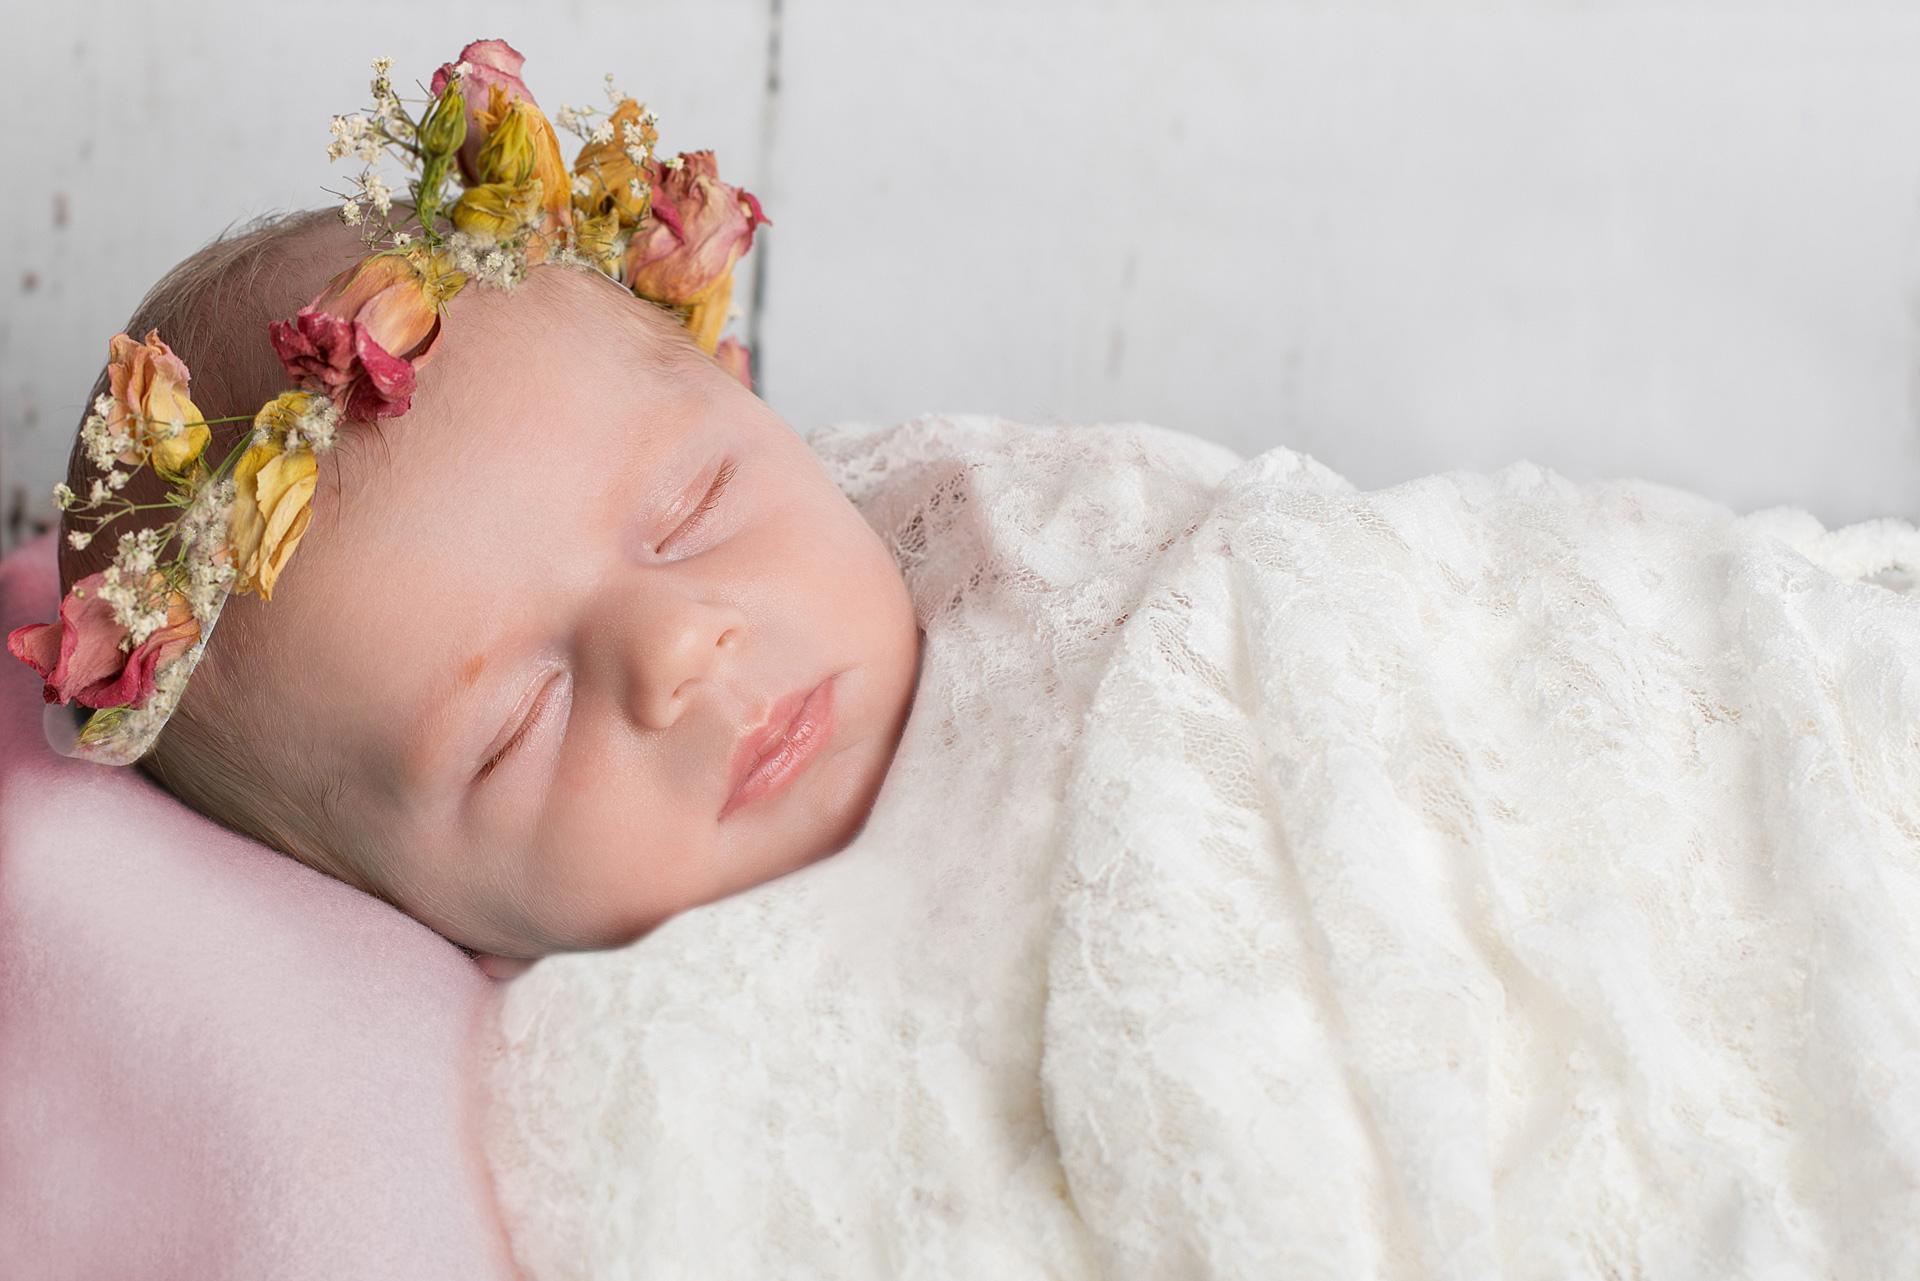 BabygirlPortraitFotoshootingRegenDeggendorfPlattling - PORTFOLIO